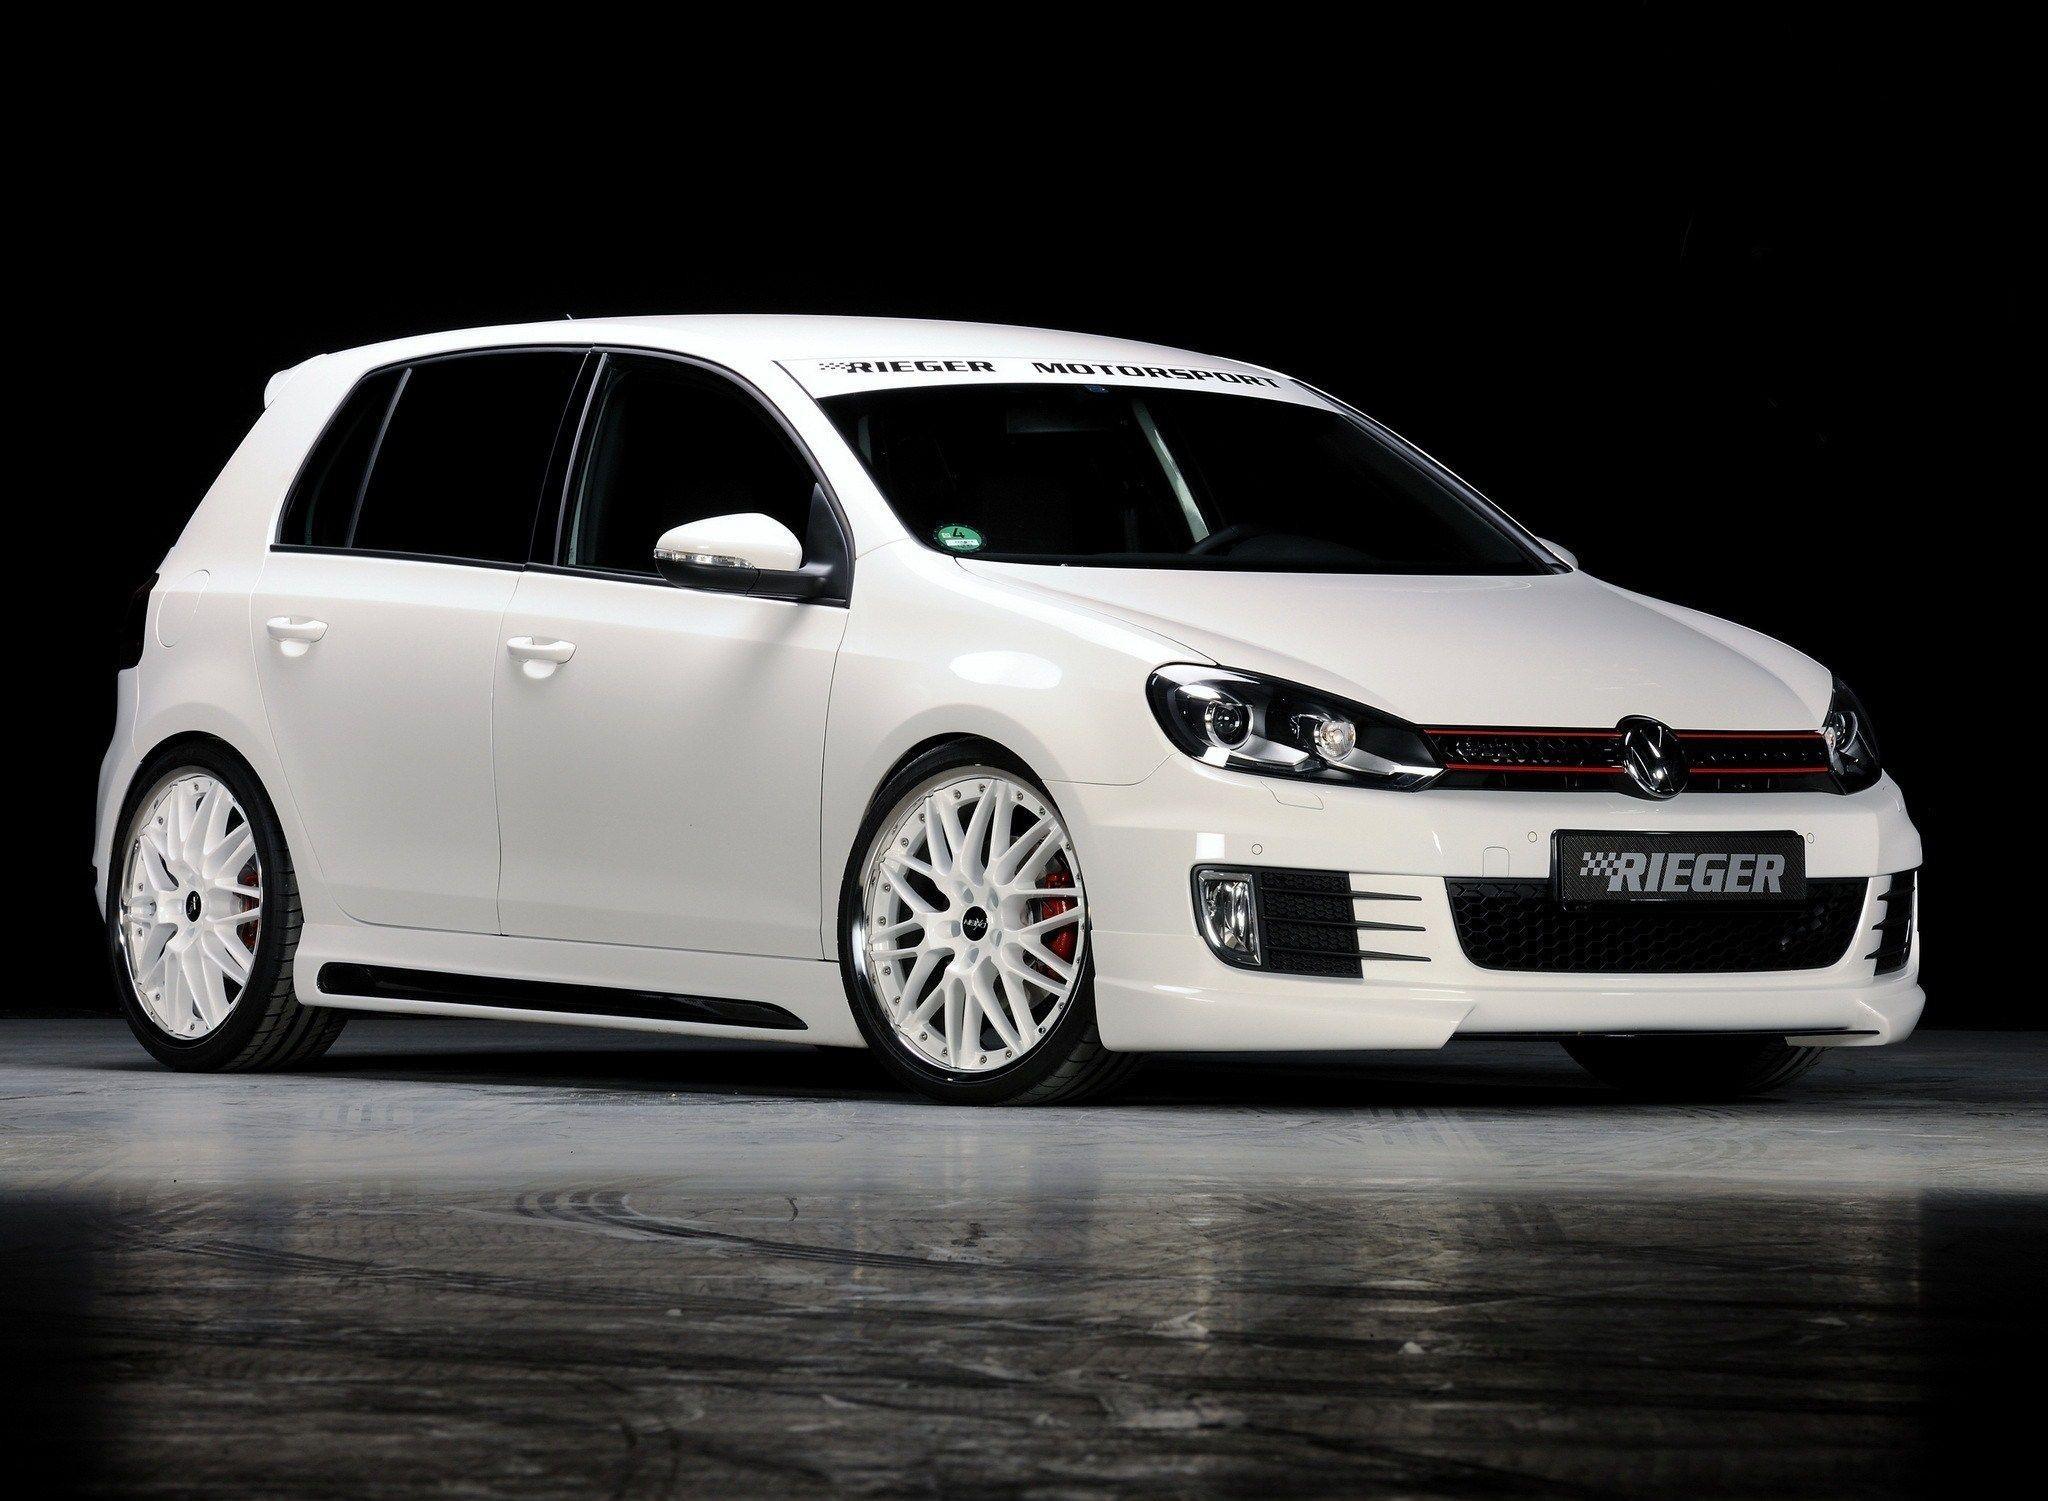 Res: 2048x1501,  Download Vw Golf 6 Gti Wallpaper Volkswagen Cars Wallpaper | Cars  .